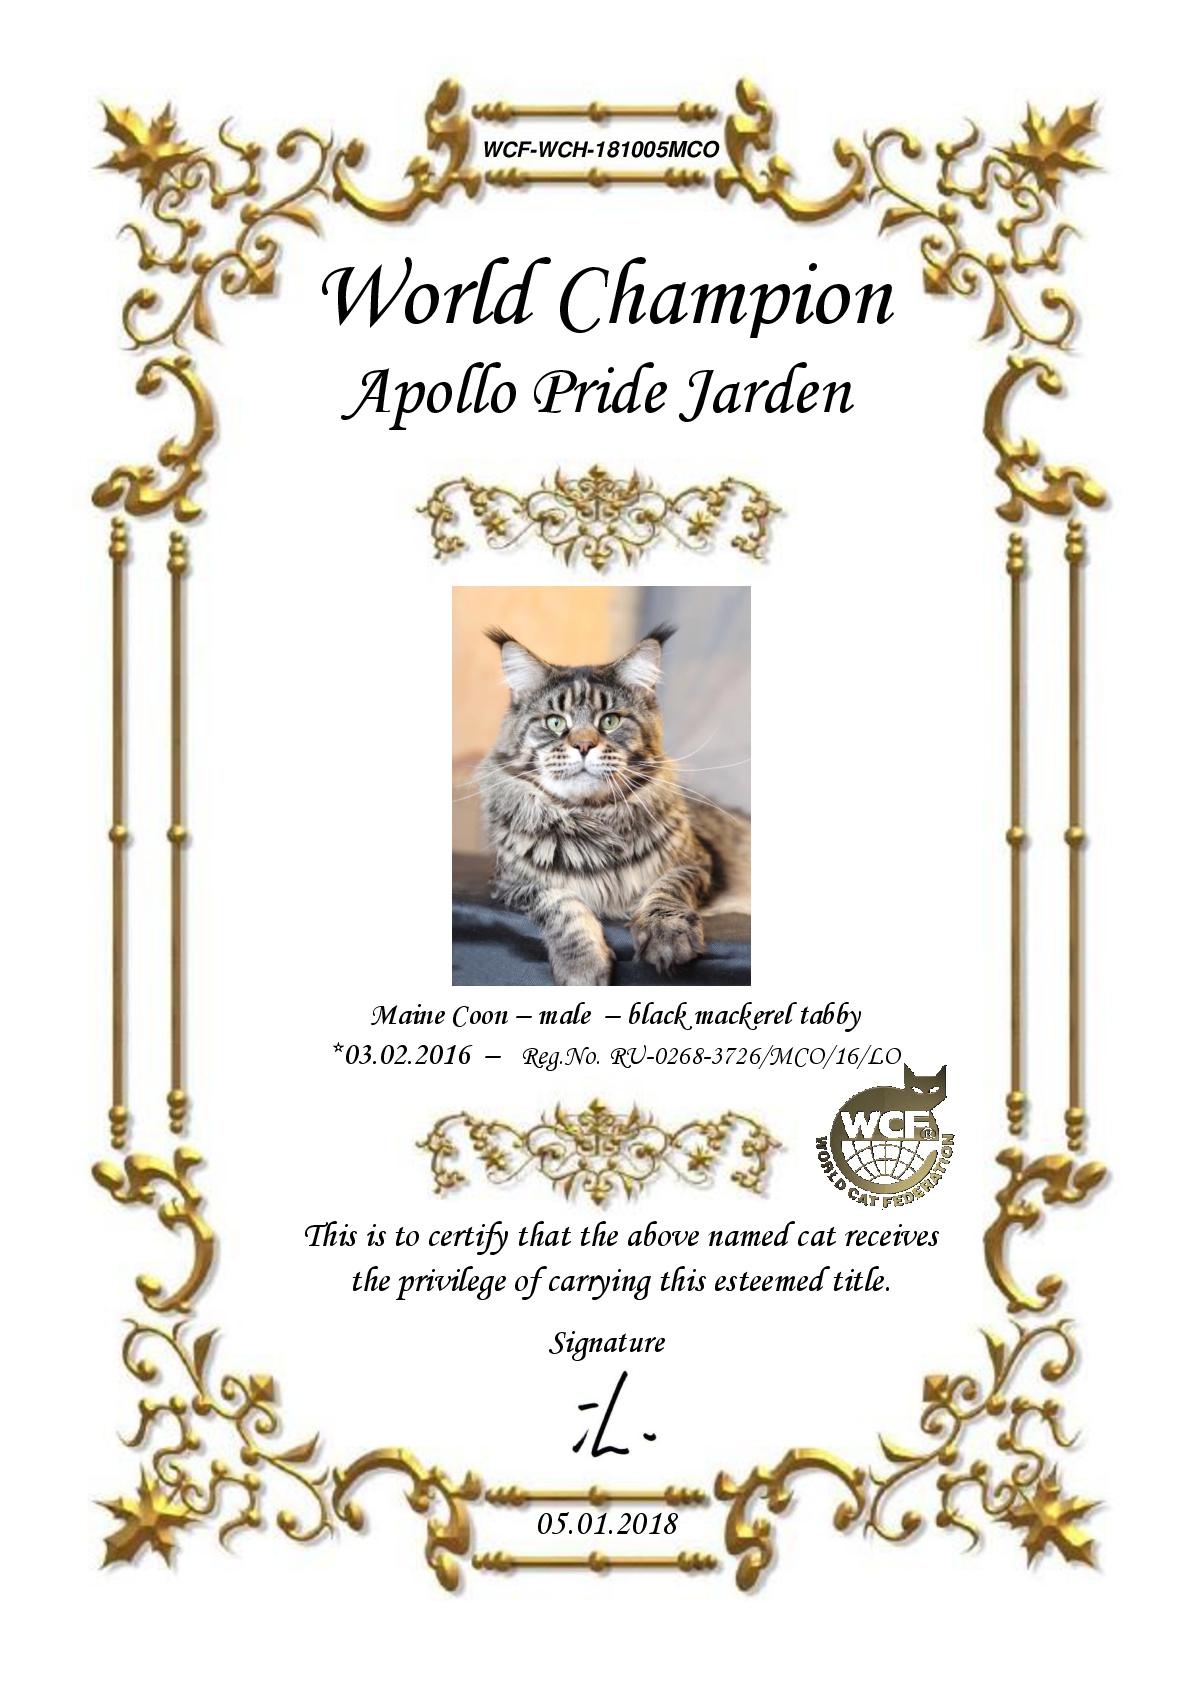 World Champion ApolloPride Jarden